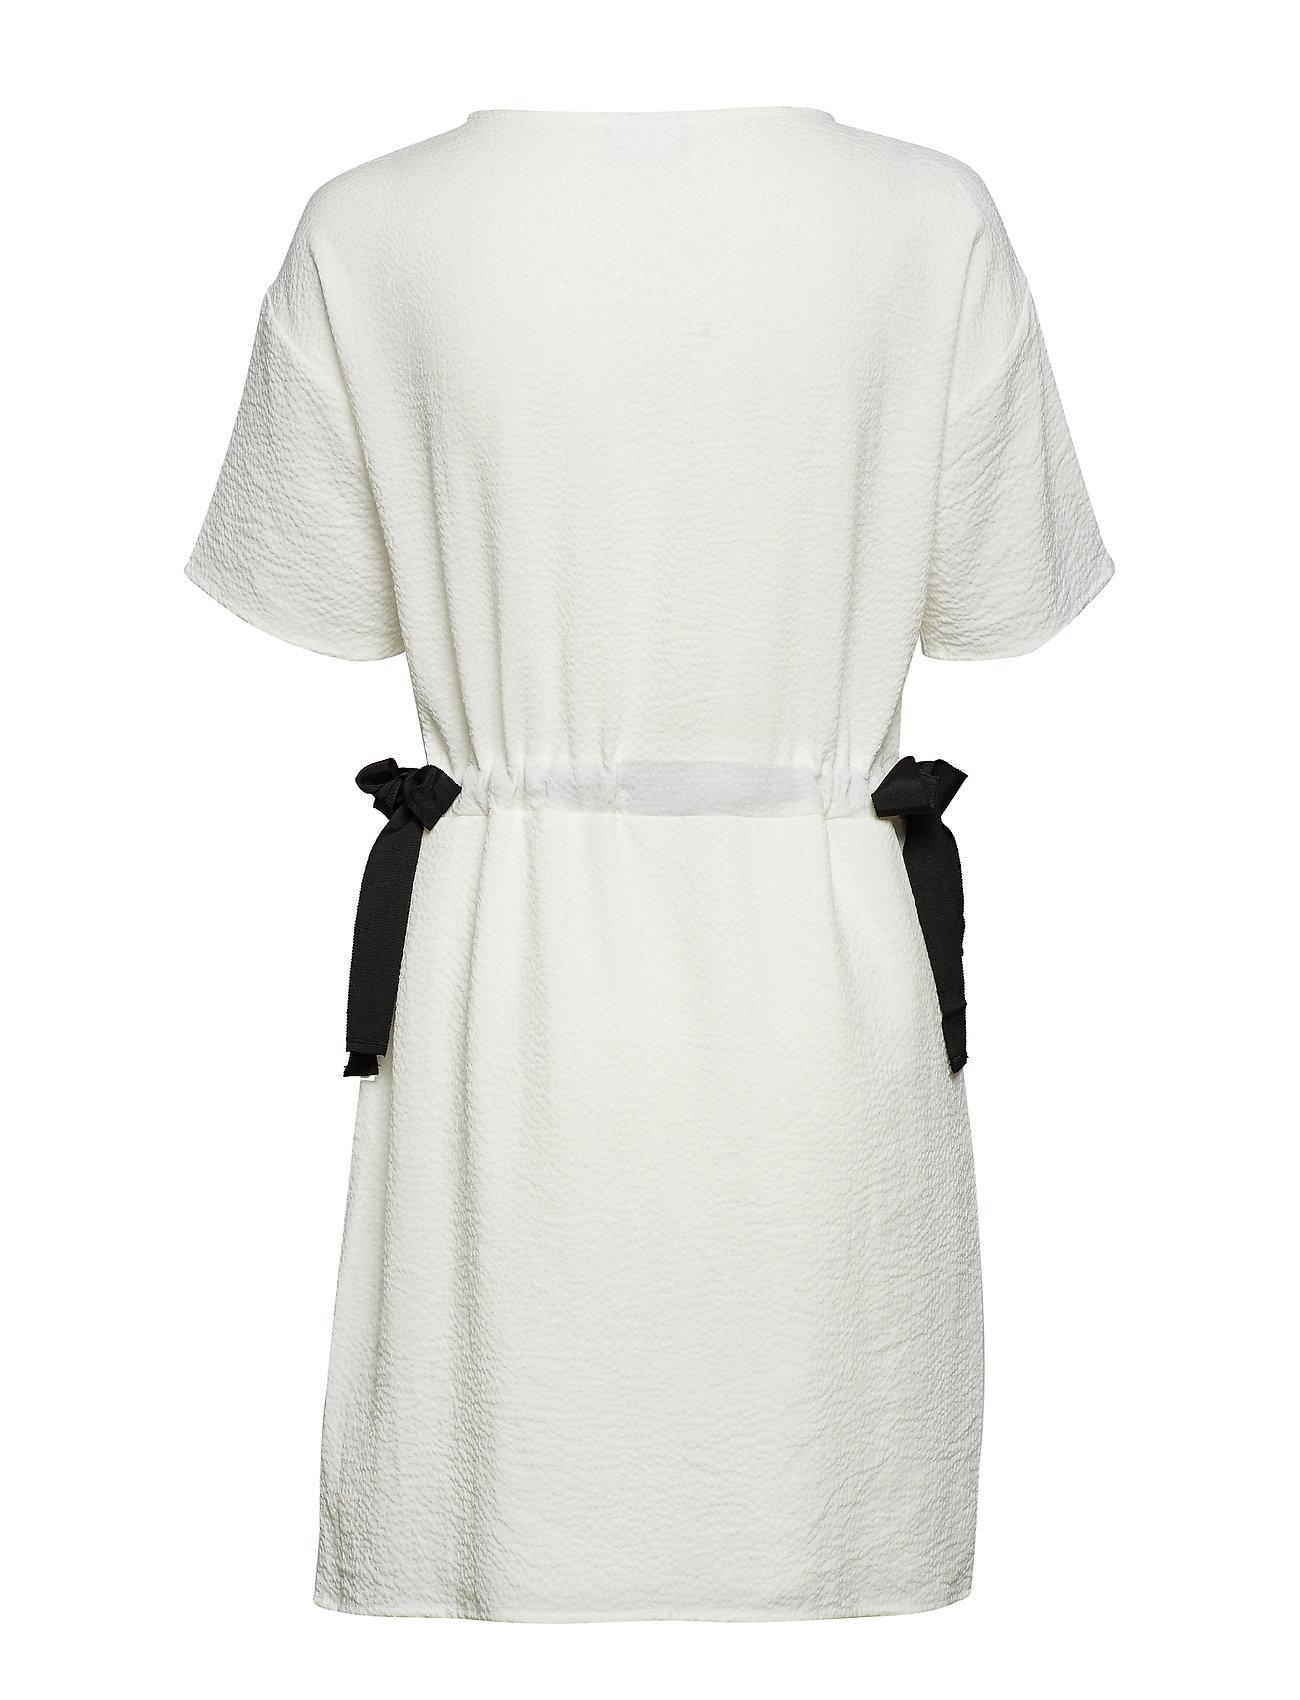 Vila - VILAMIDA 2/4 DRESS - short dresses - snow white - 1